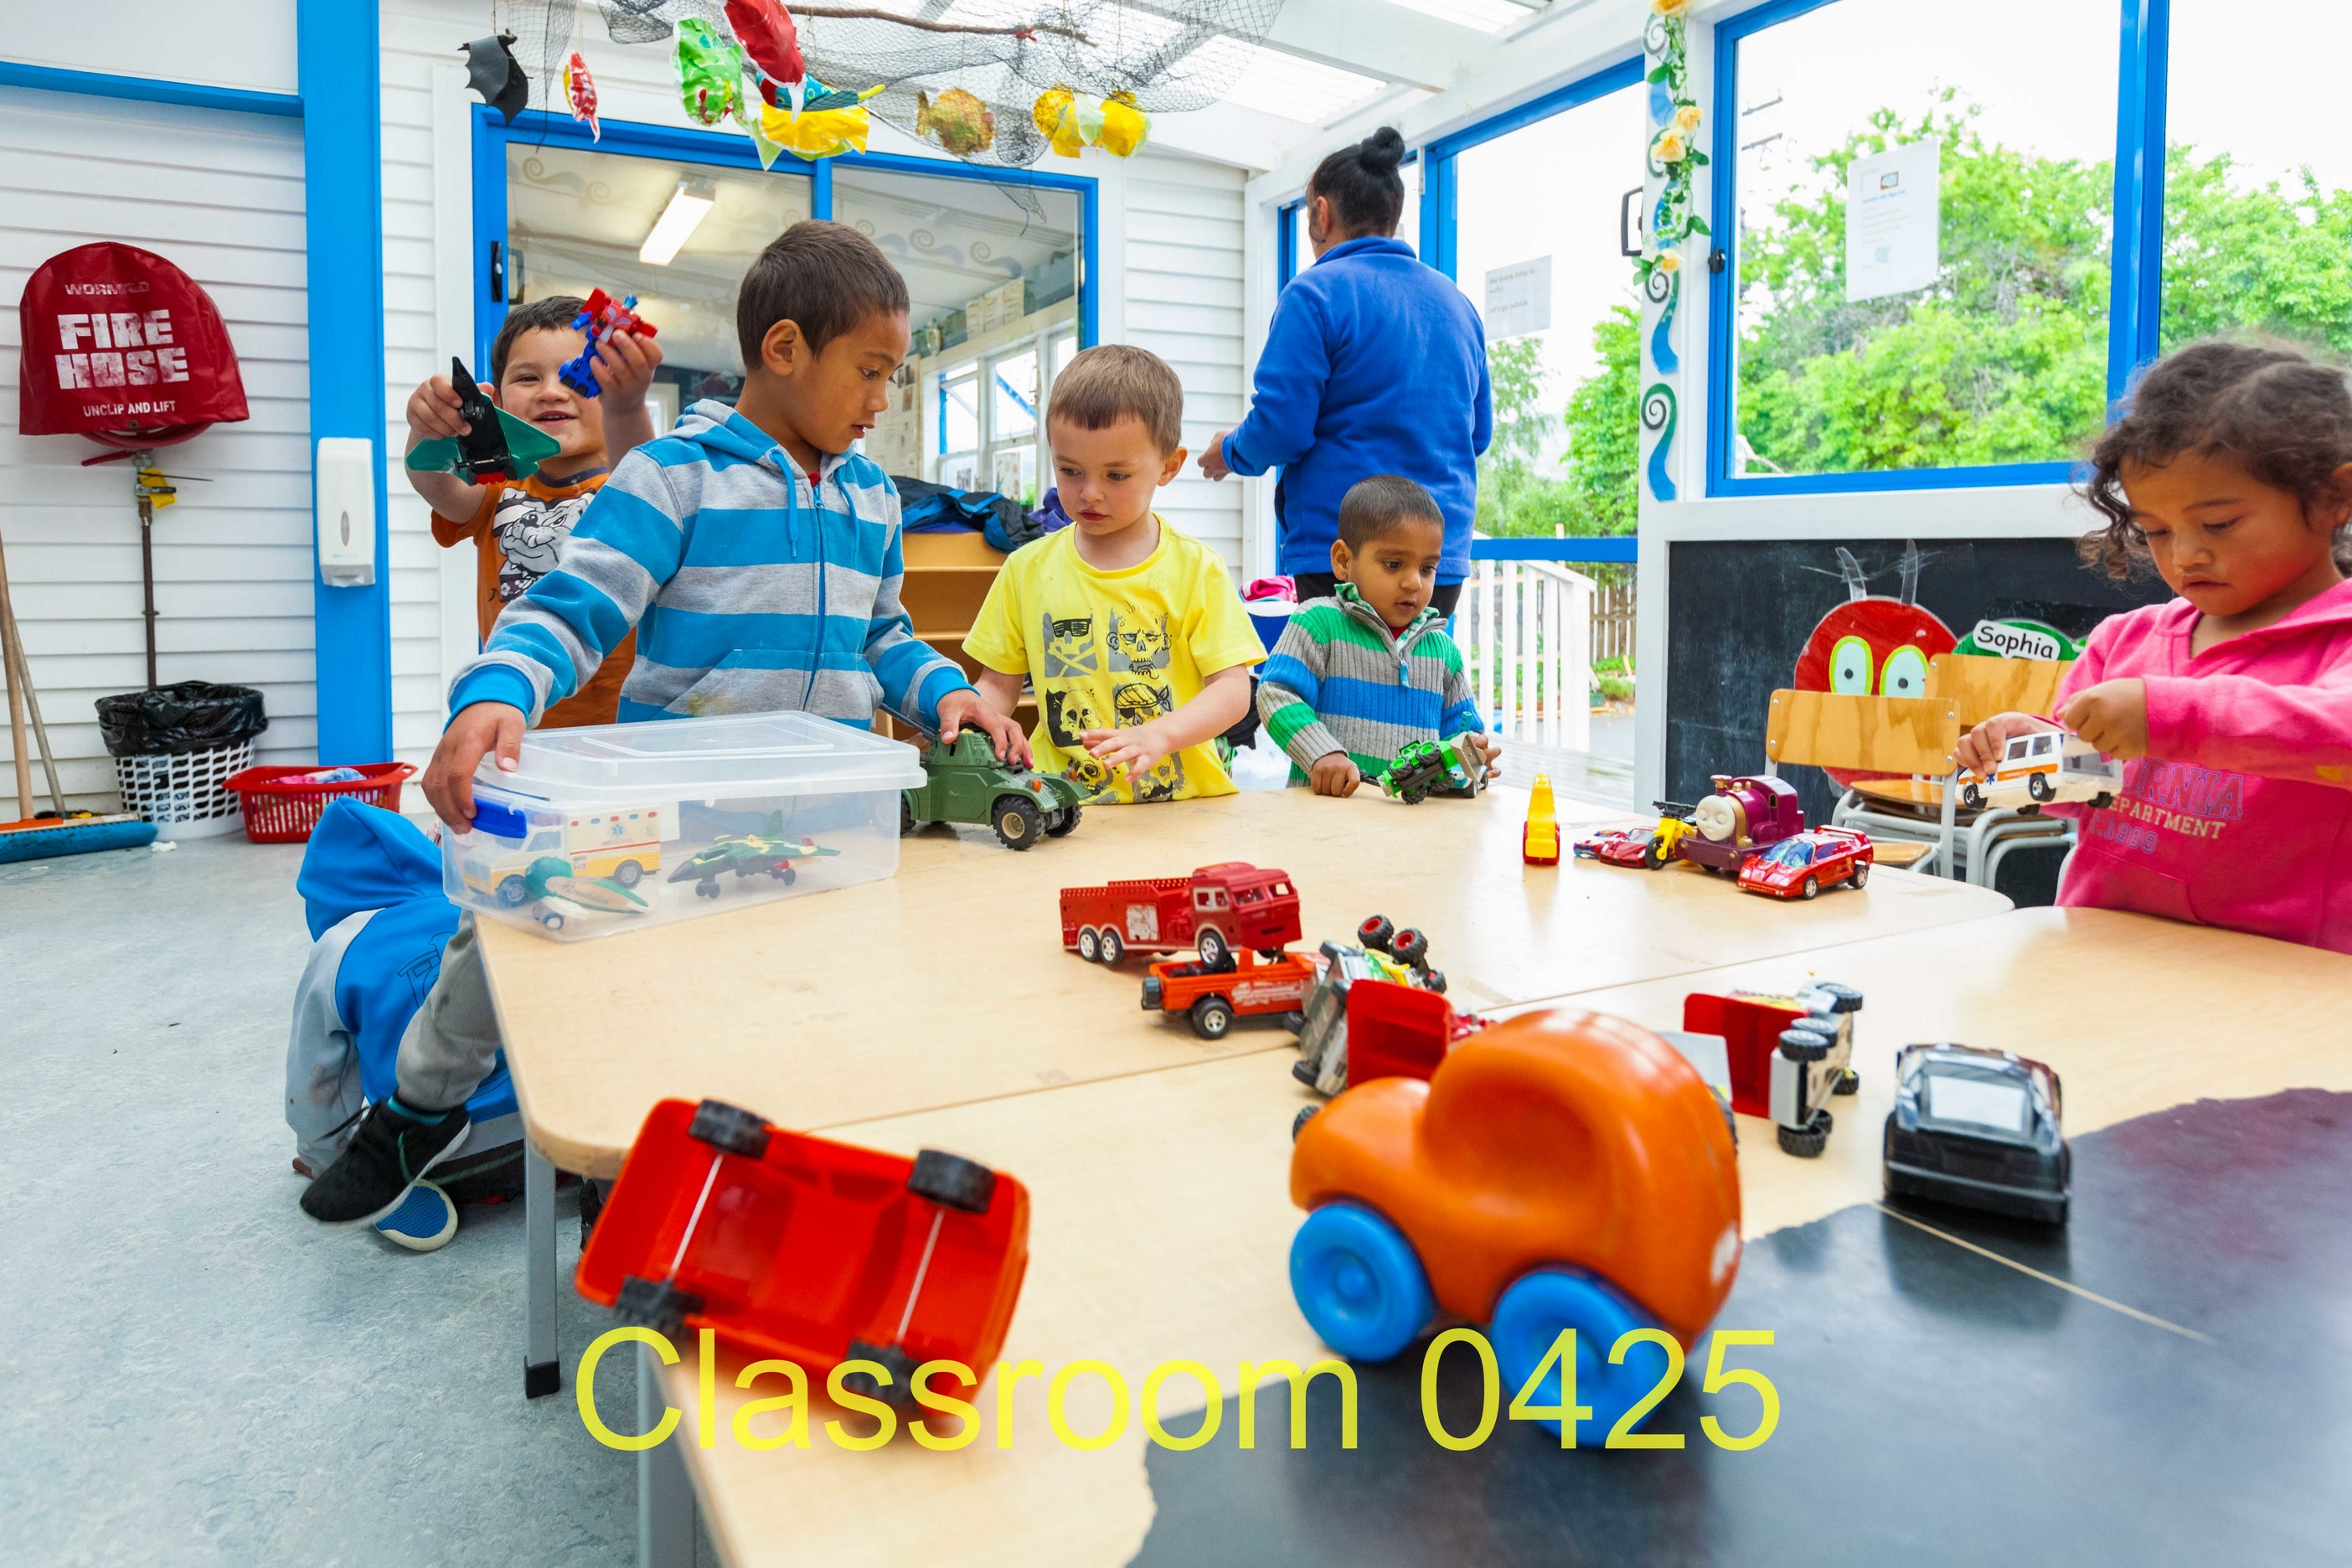 Classroom 0425